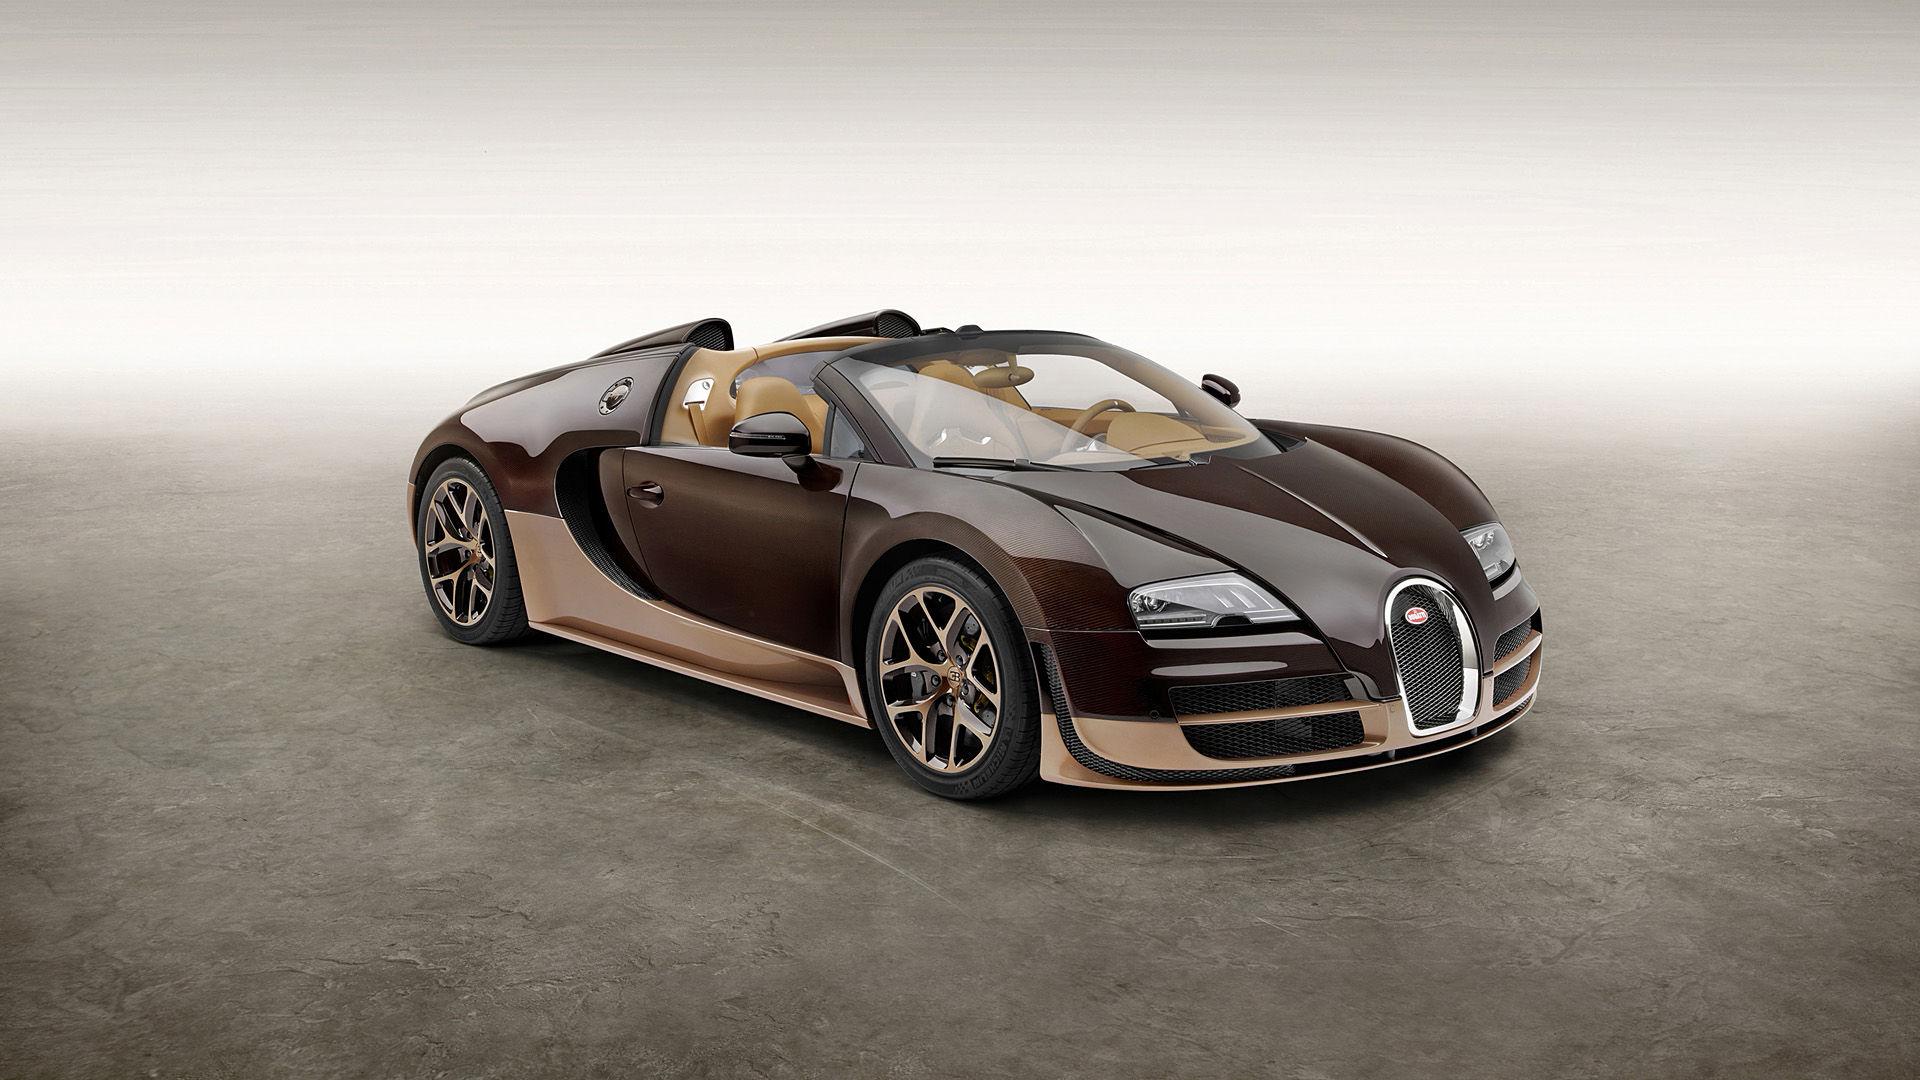 2014 Bugatti Veyron Rembrandt